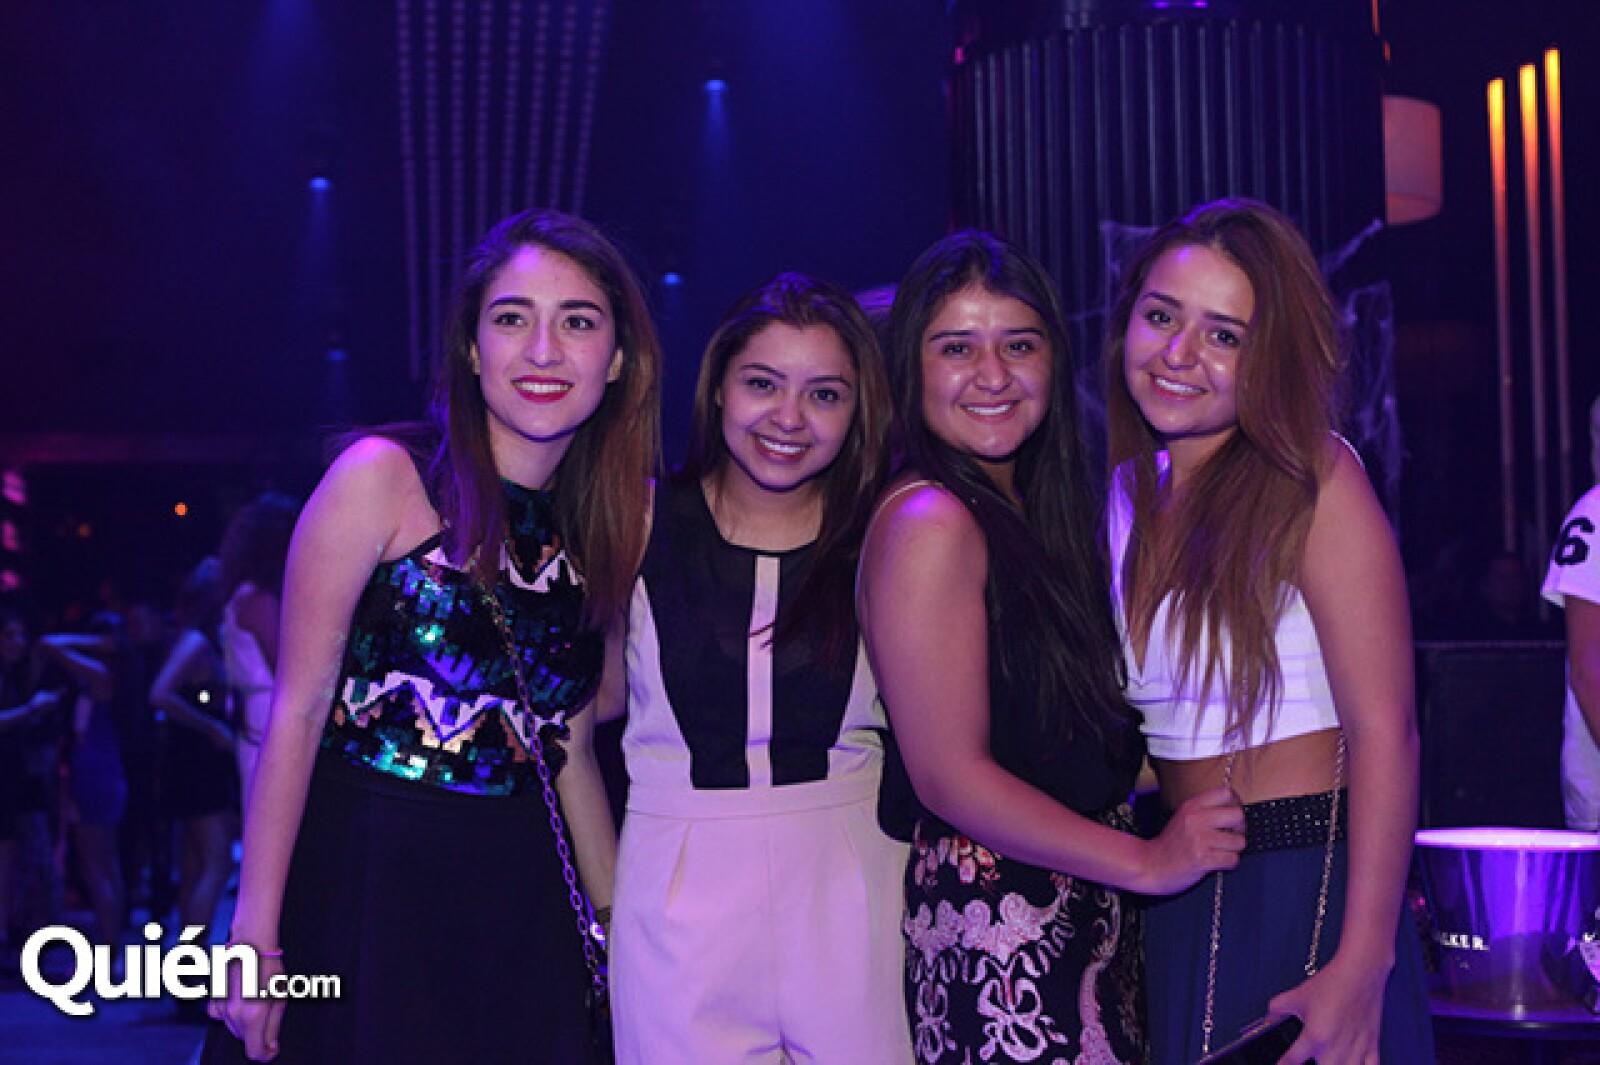 Mariana Acosta,Fer Gallegos,Karen Gómez y Soraya Gómez